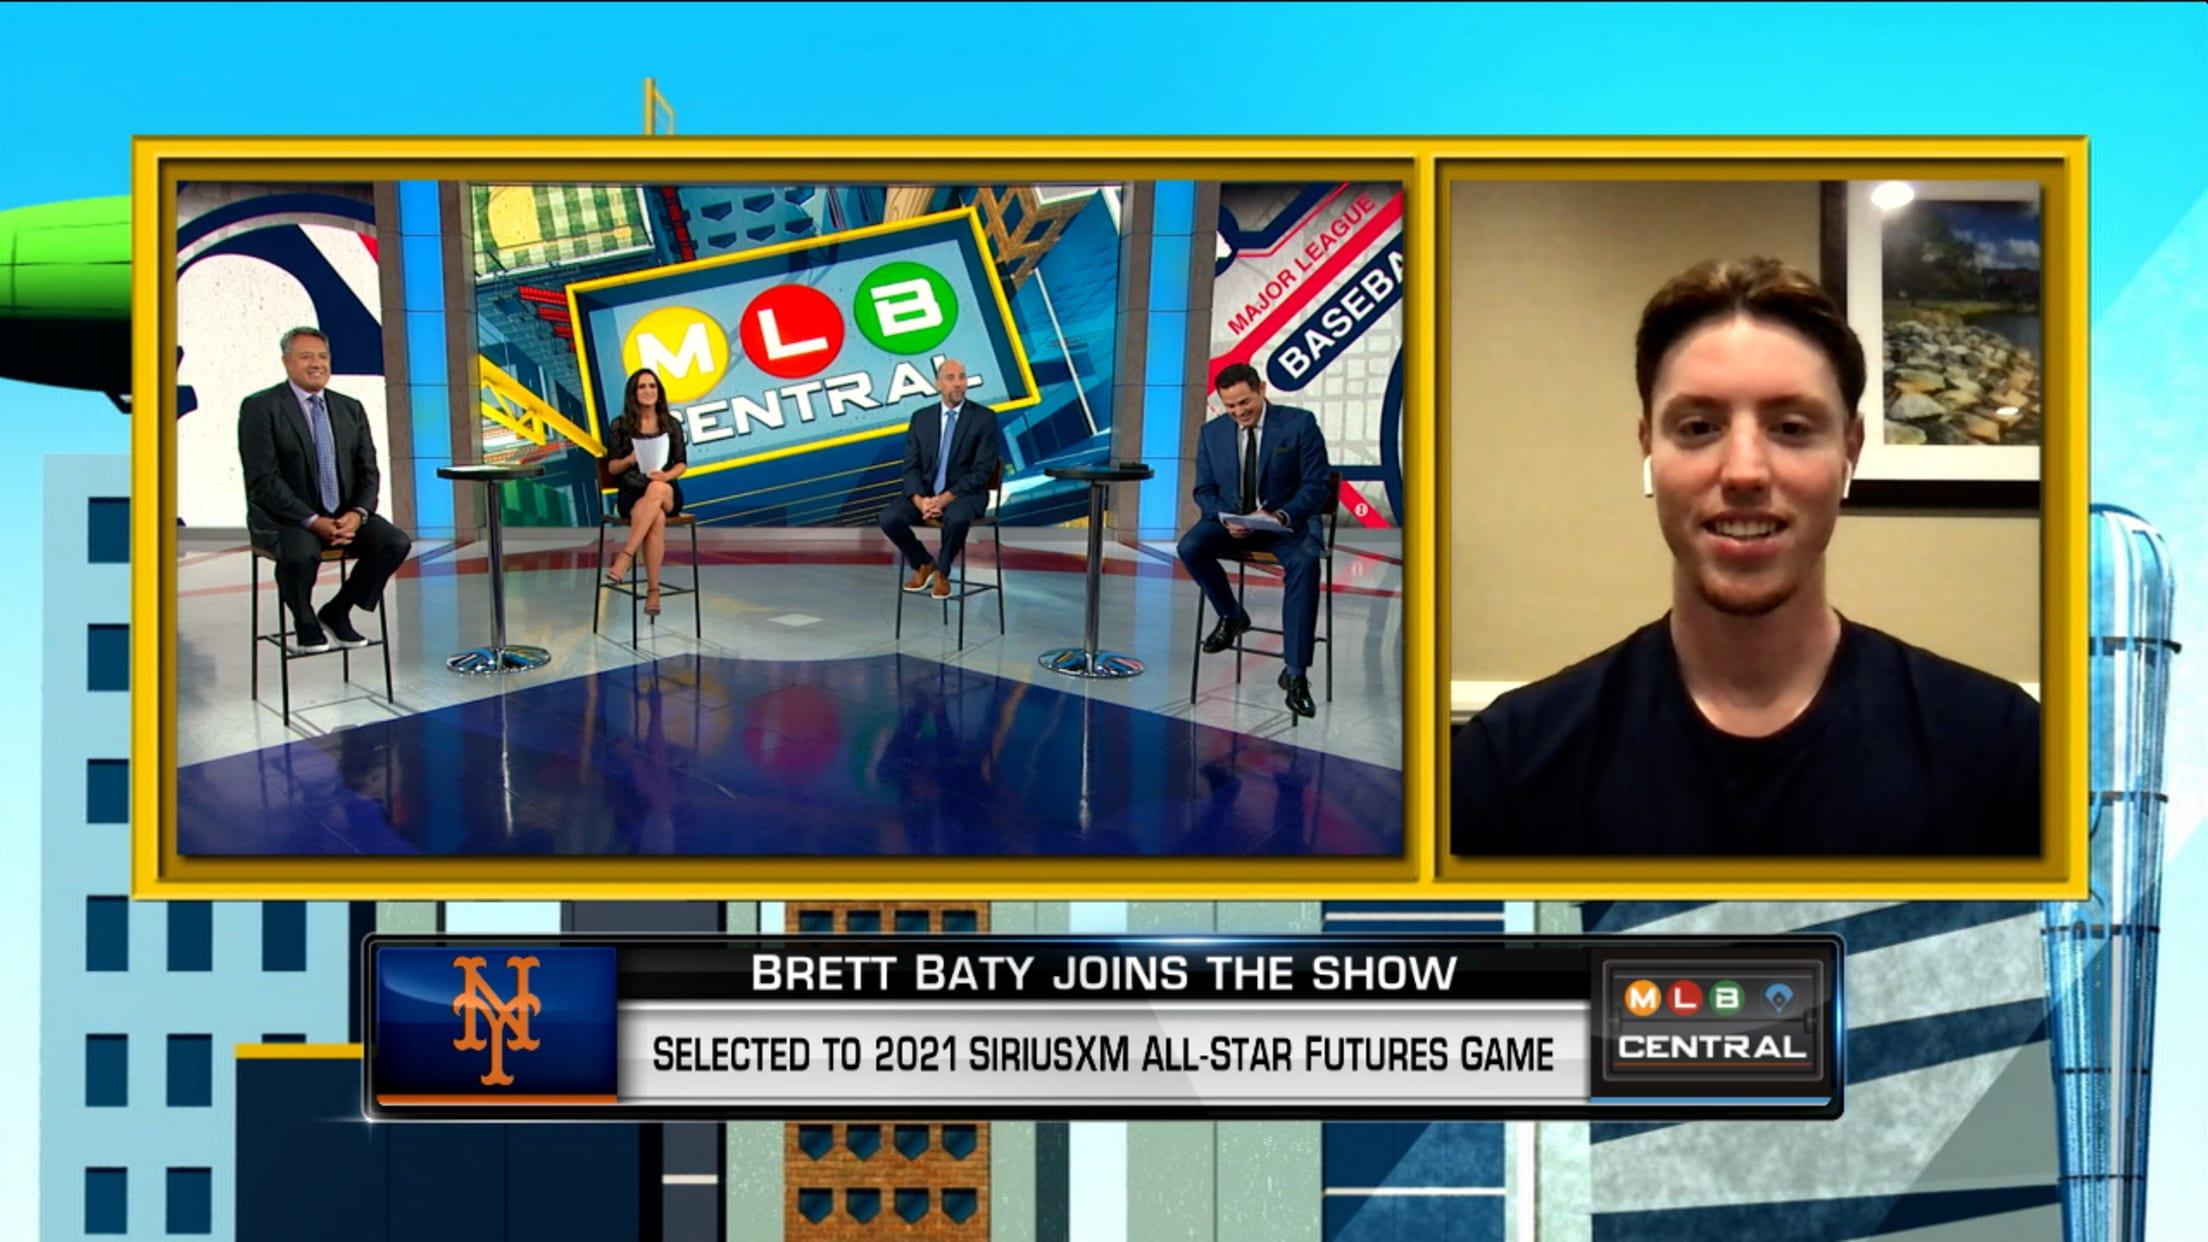 Brett Baty on Futures Game, more